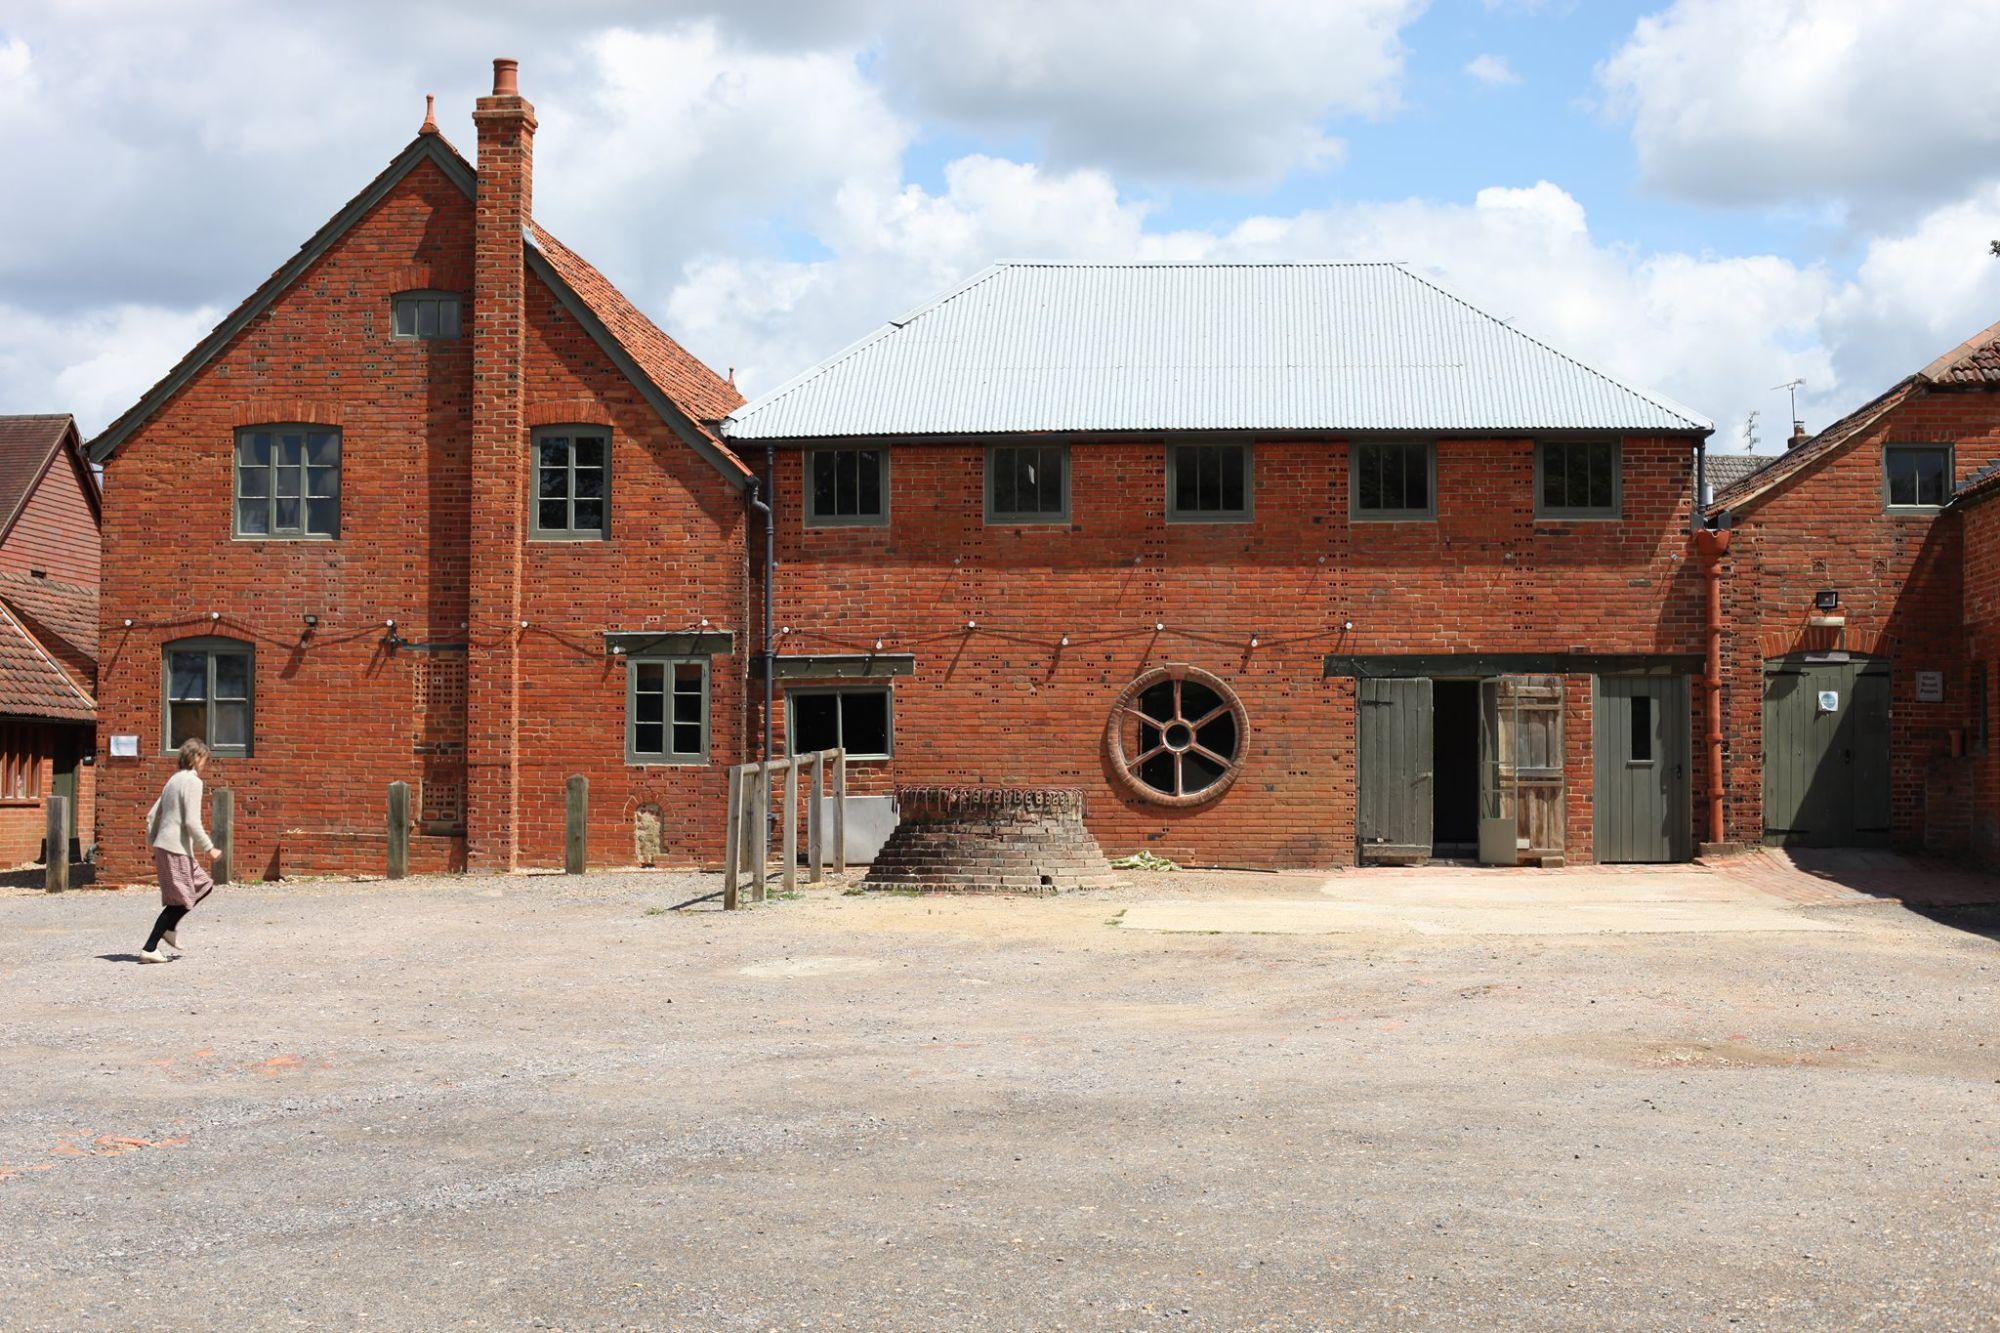 Historic Farnham Pottery building